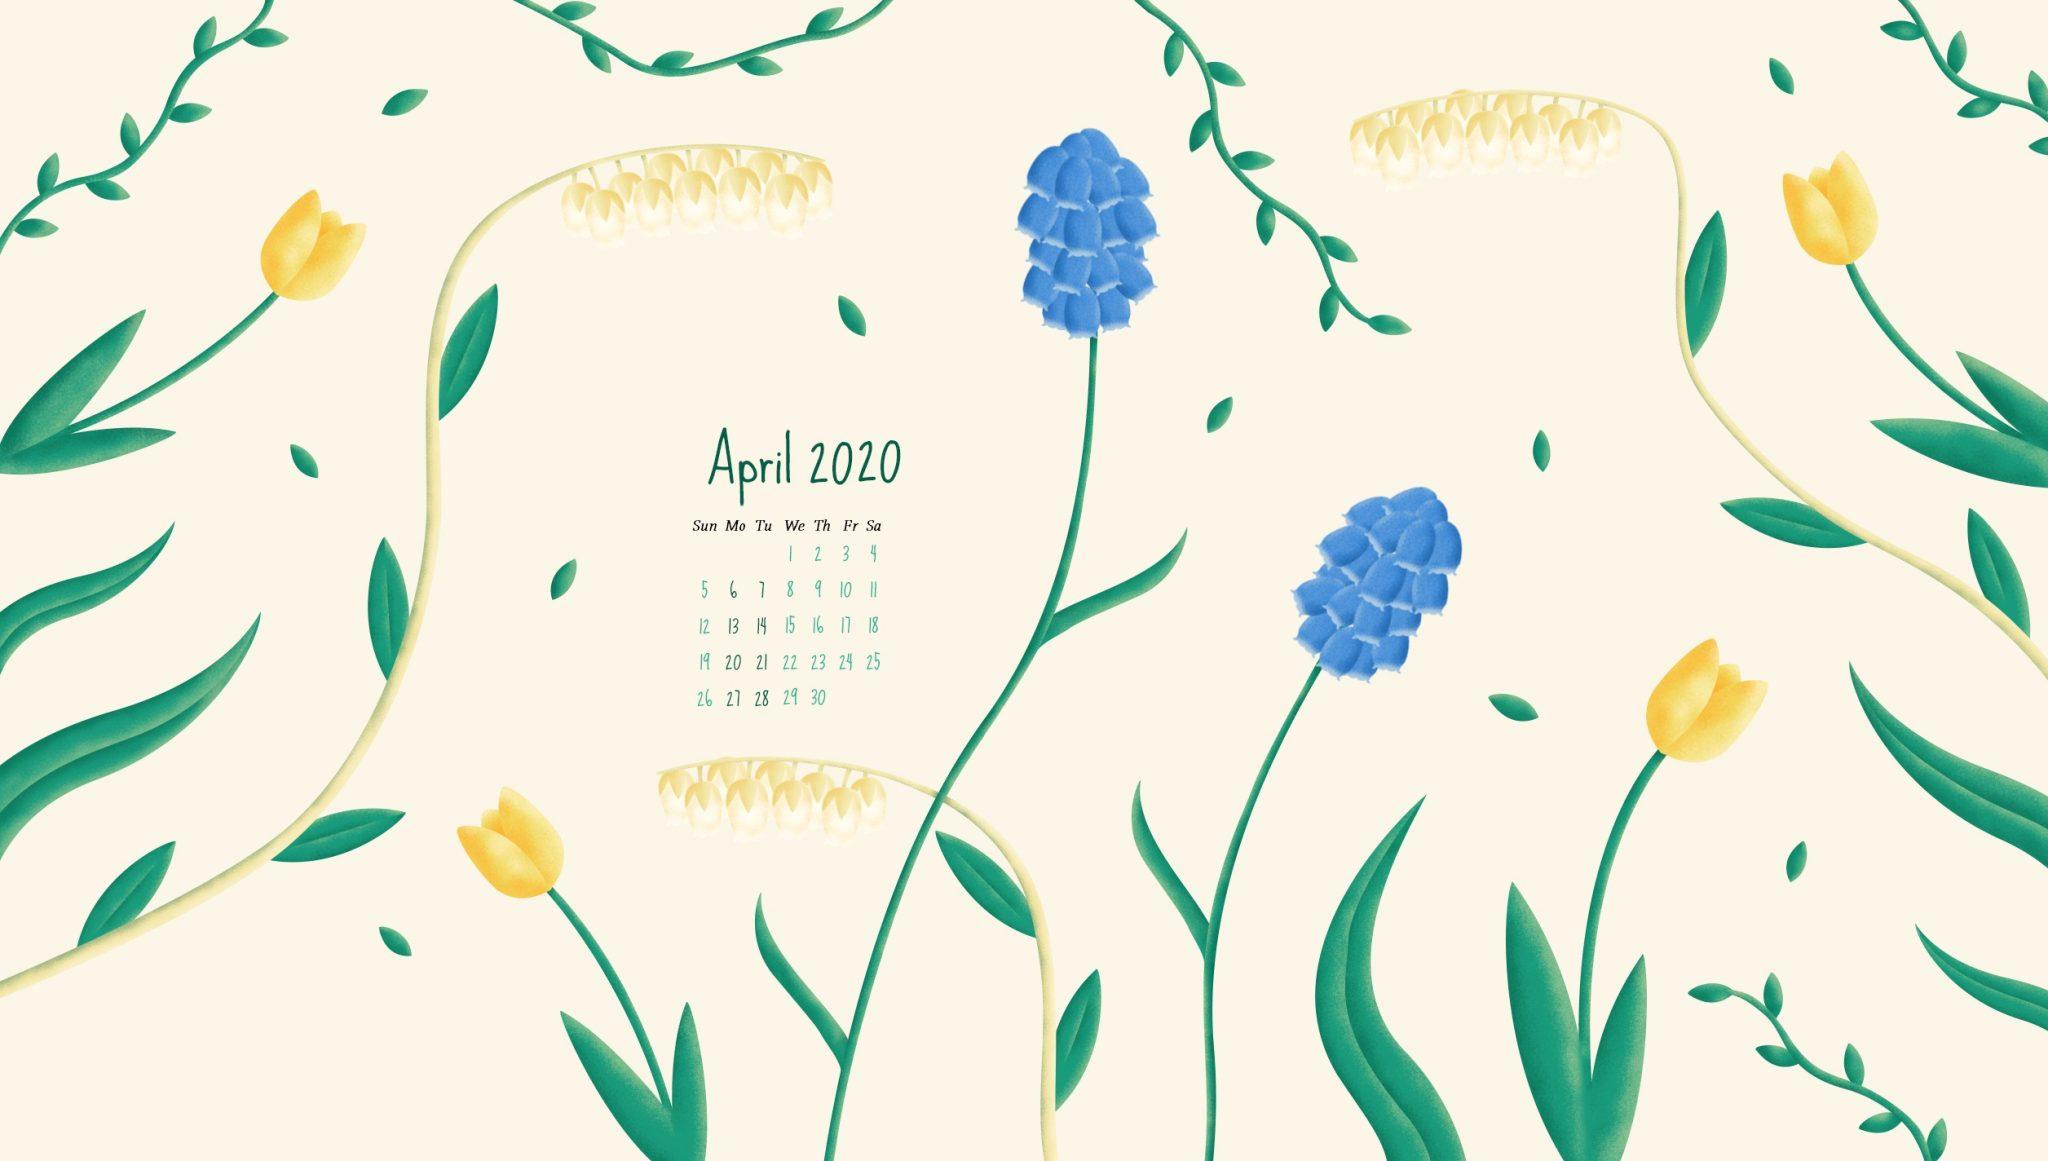 Desktop Calendar Wallpaper April 2020